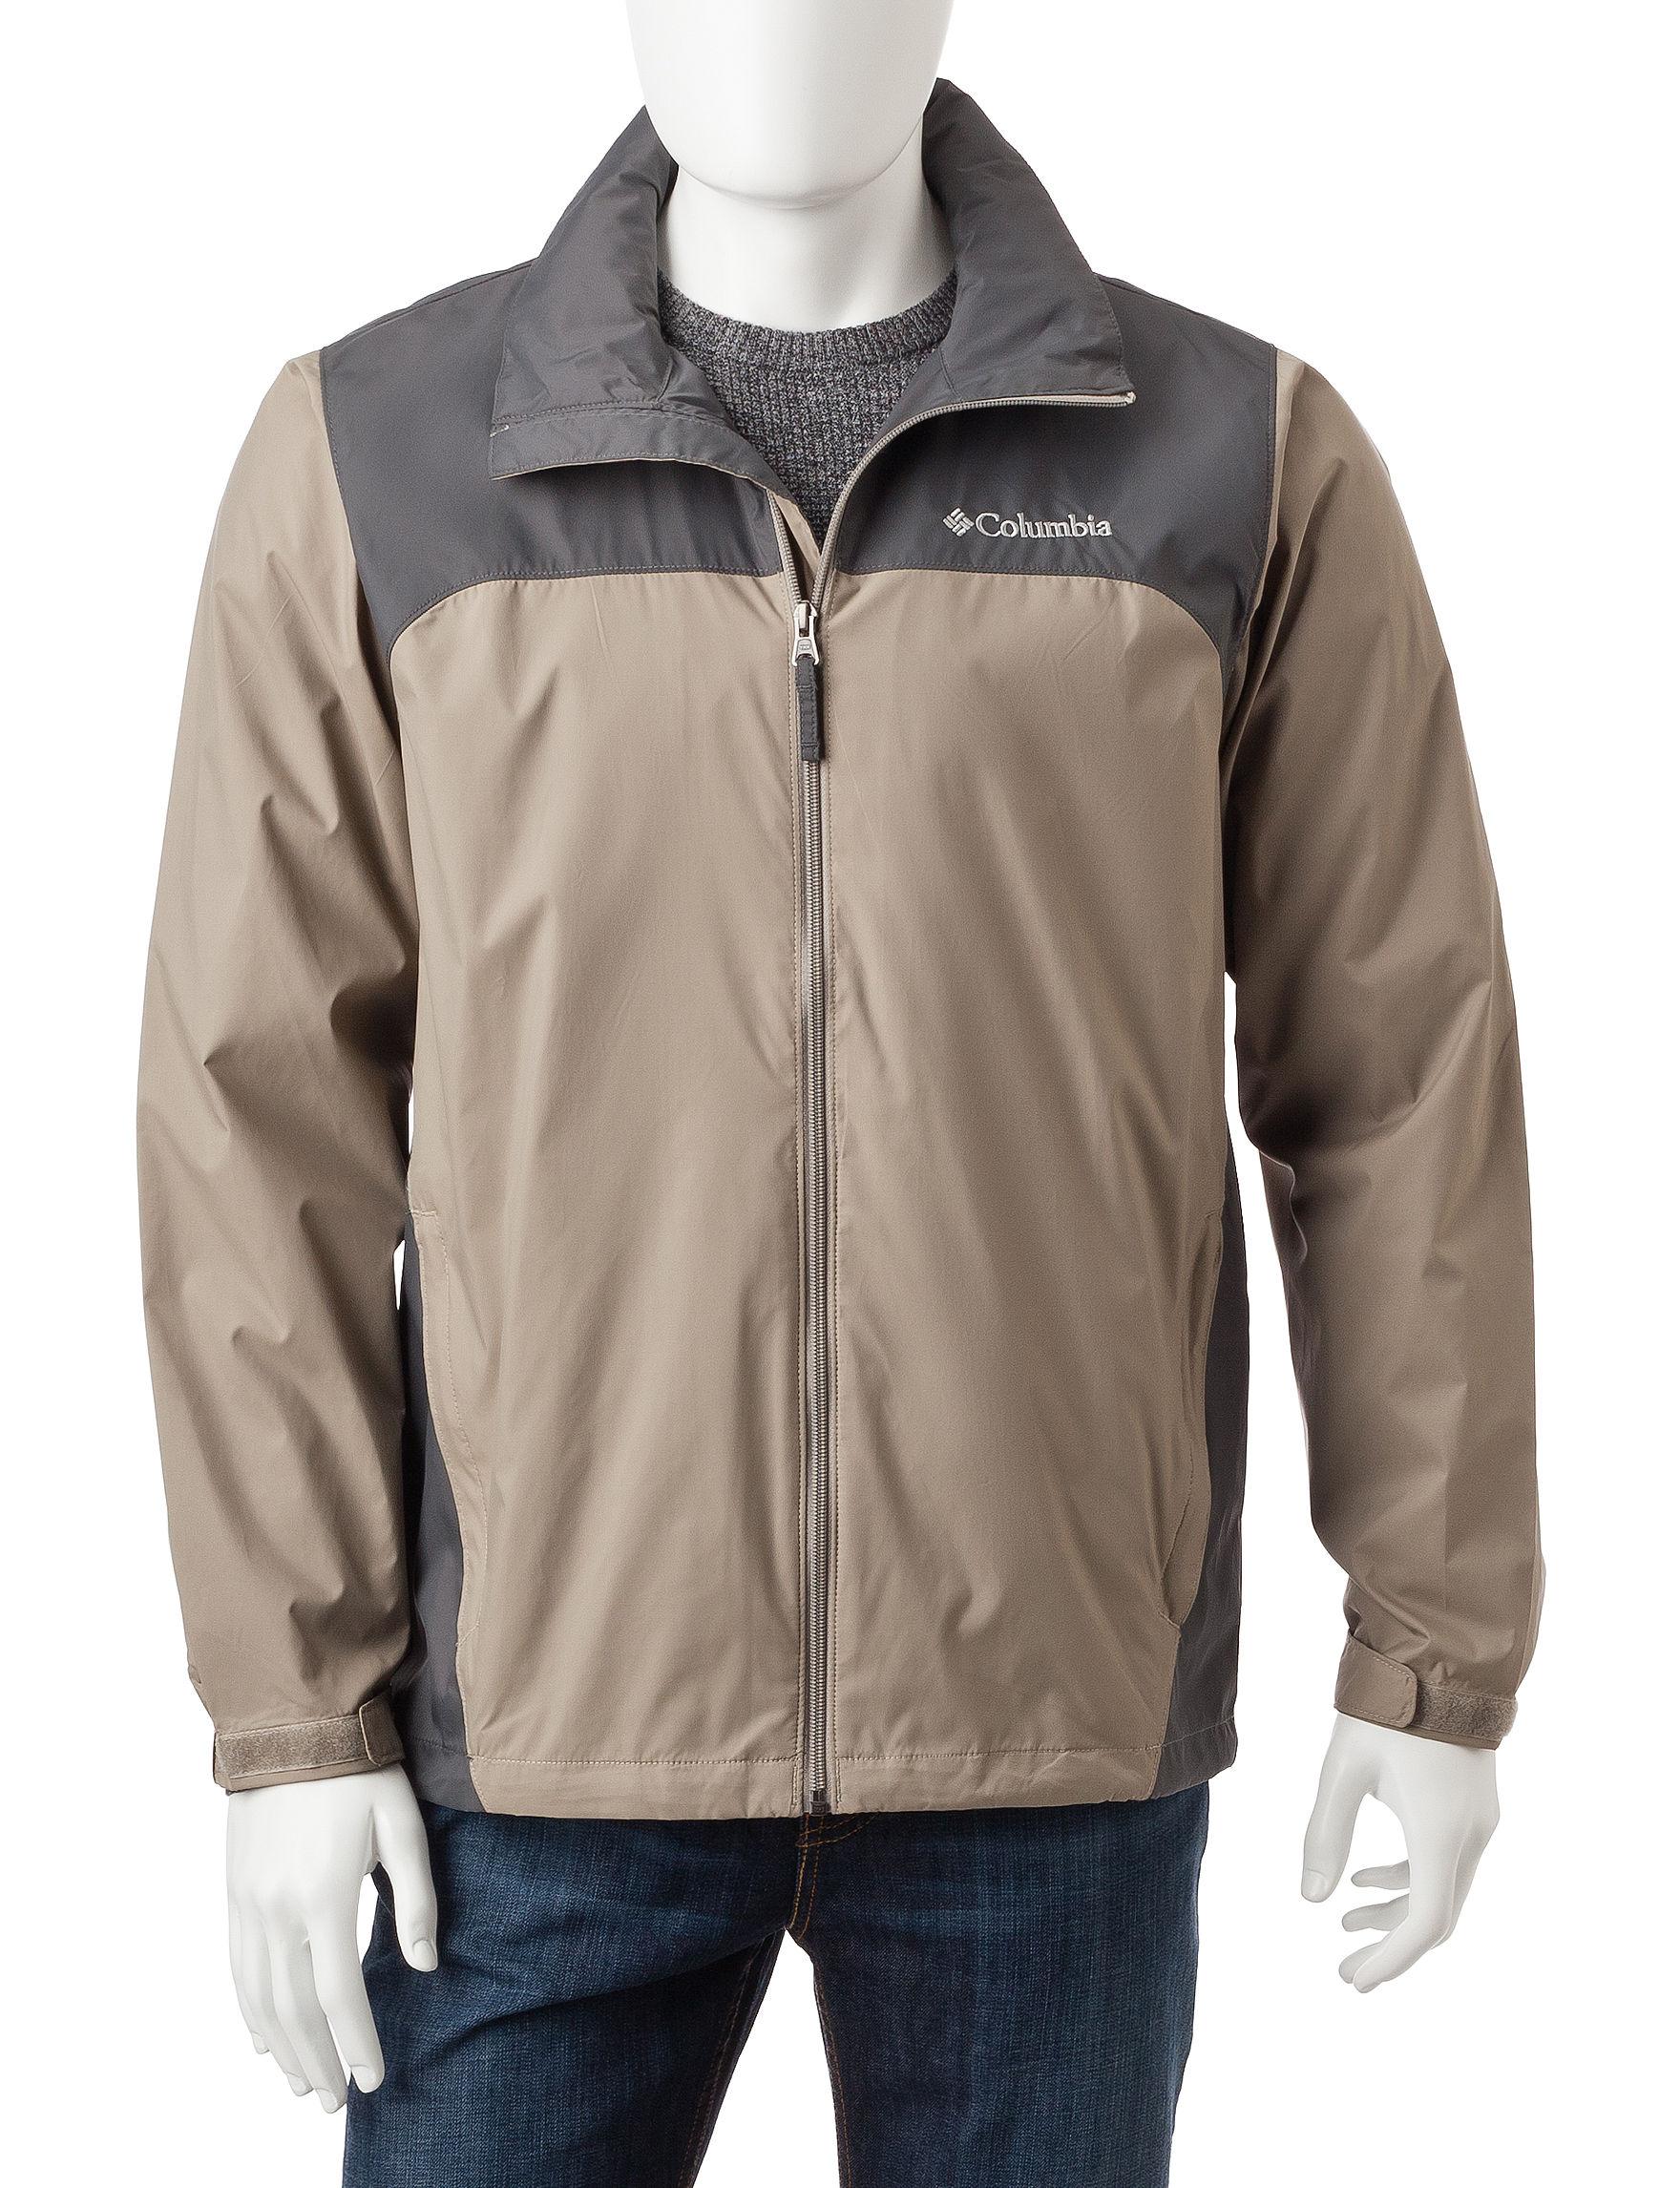 Columbia Tusk Rain & Snow Jackets